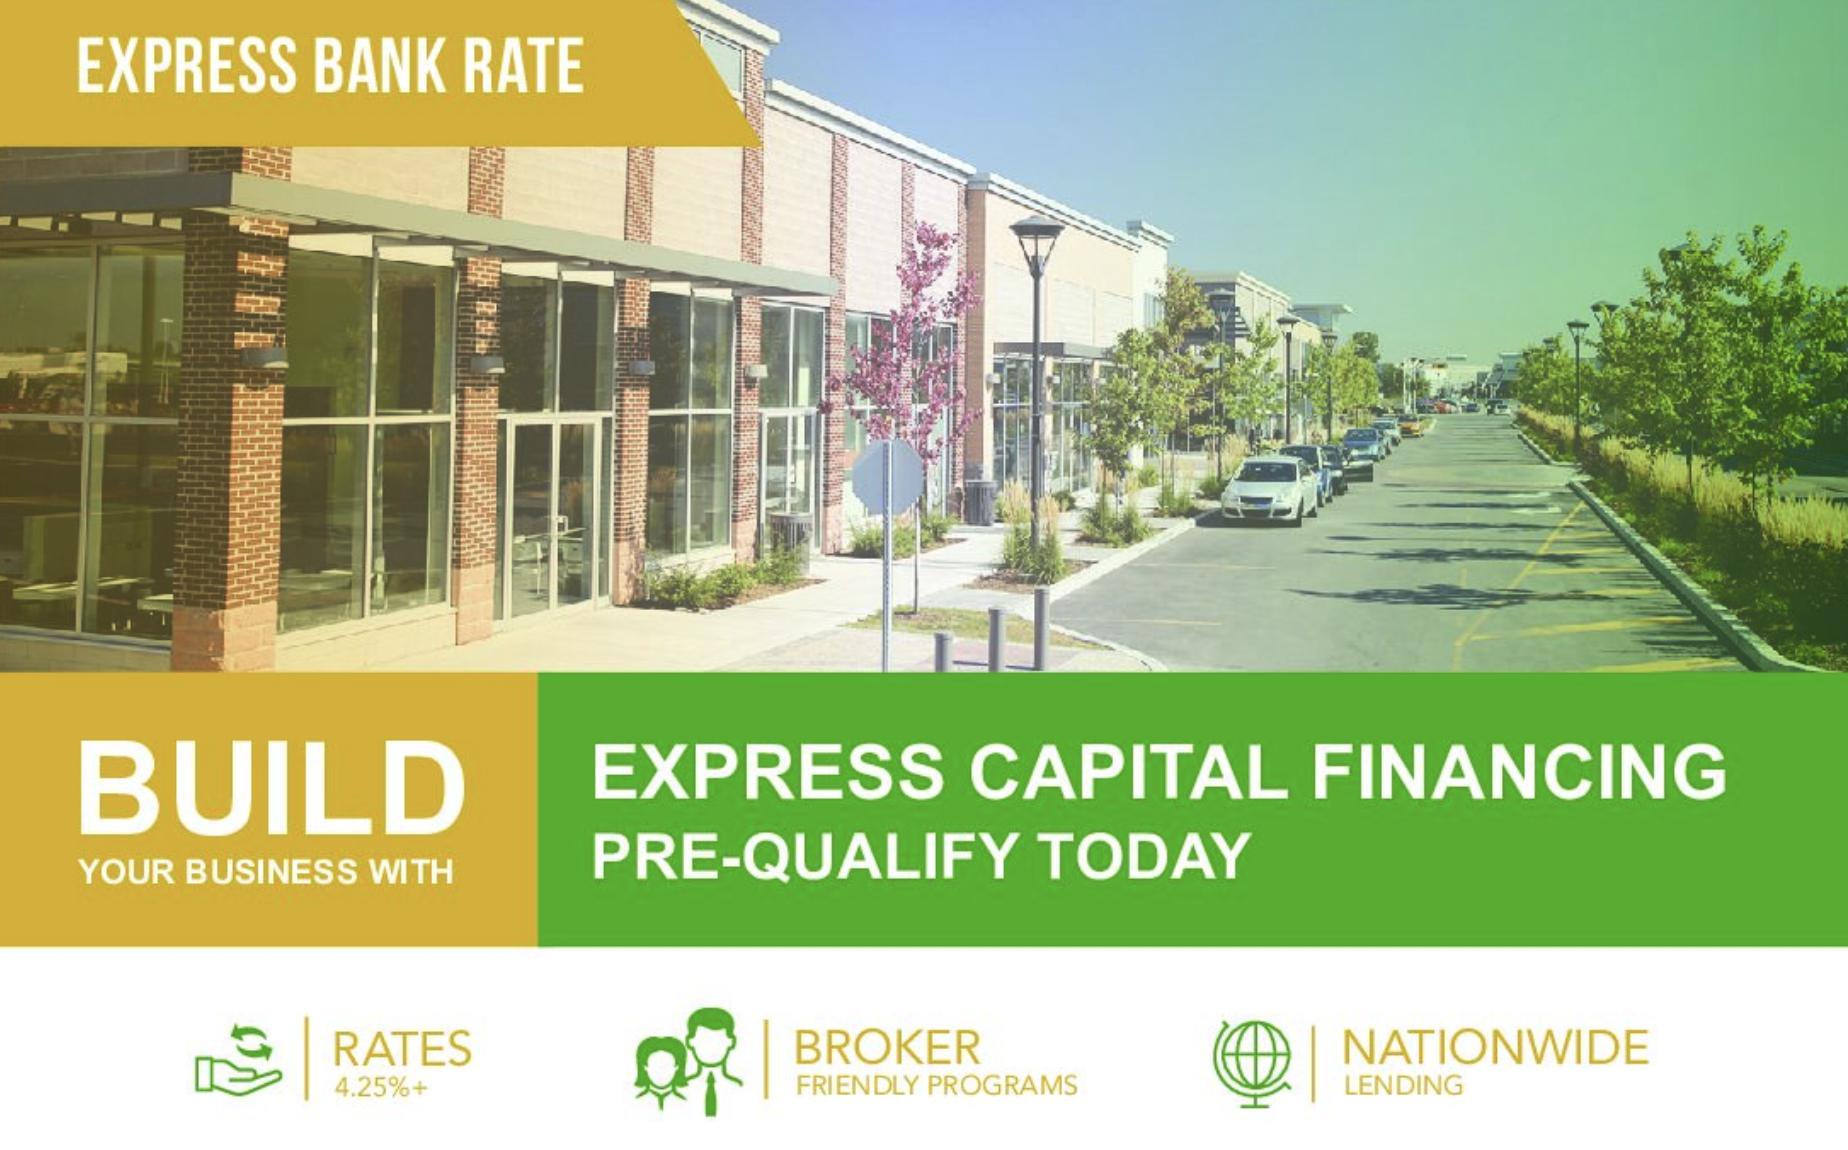 EXPRESS BANK RATE